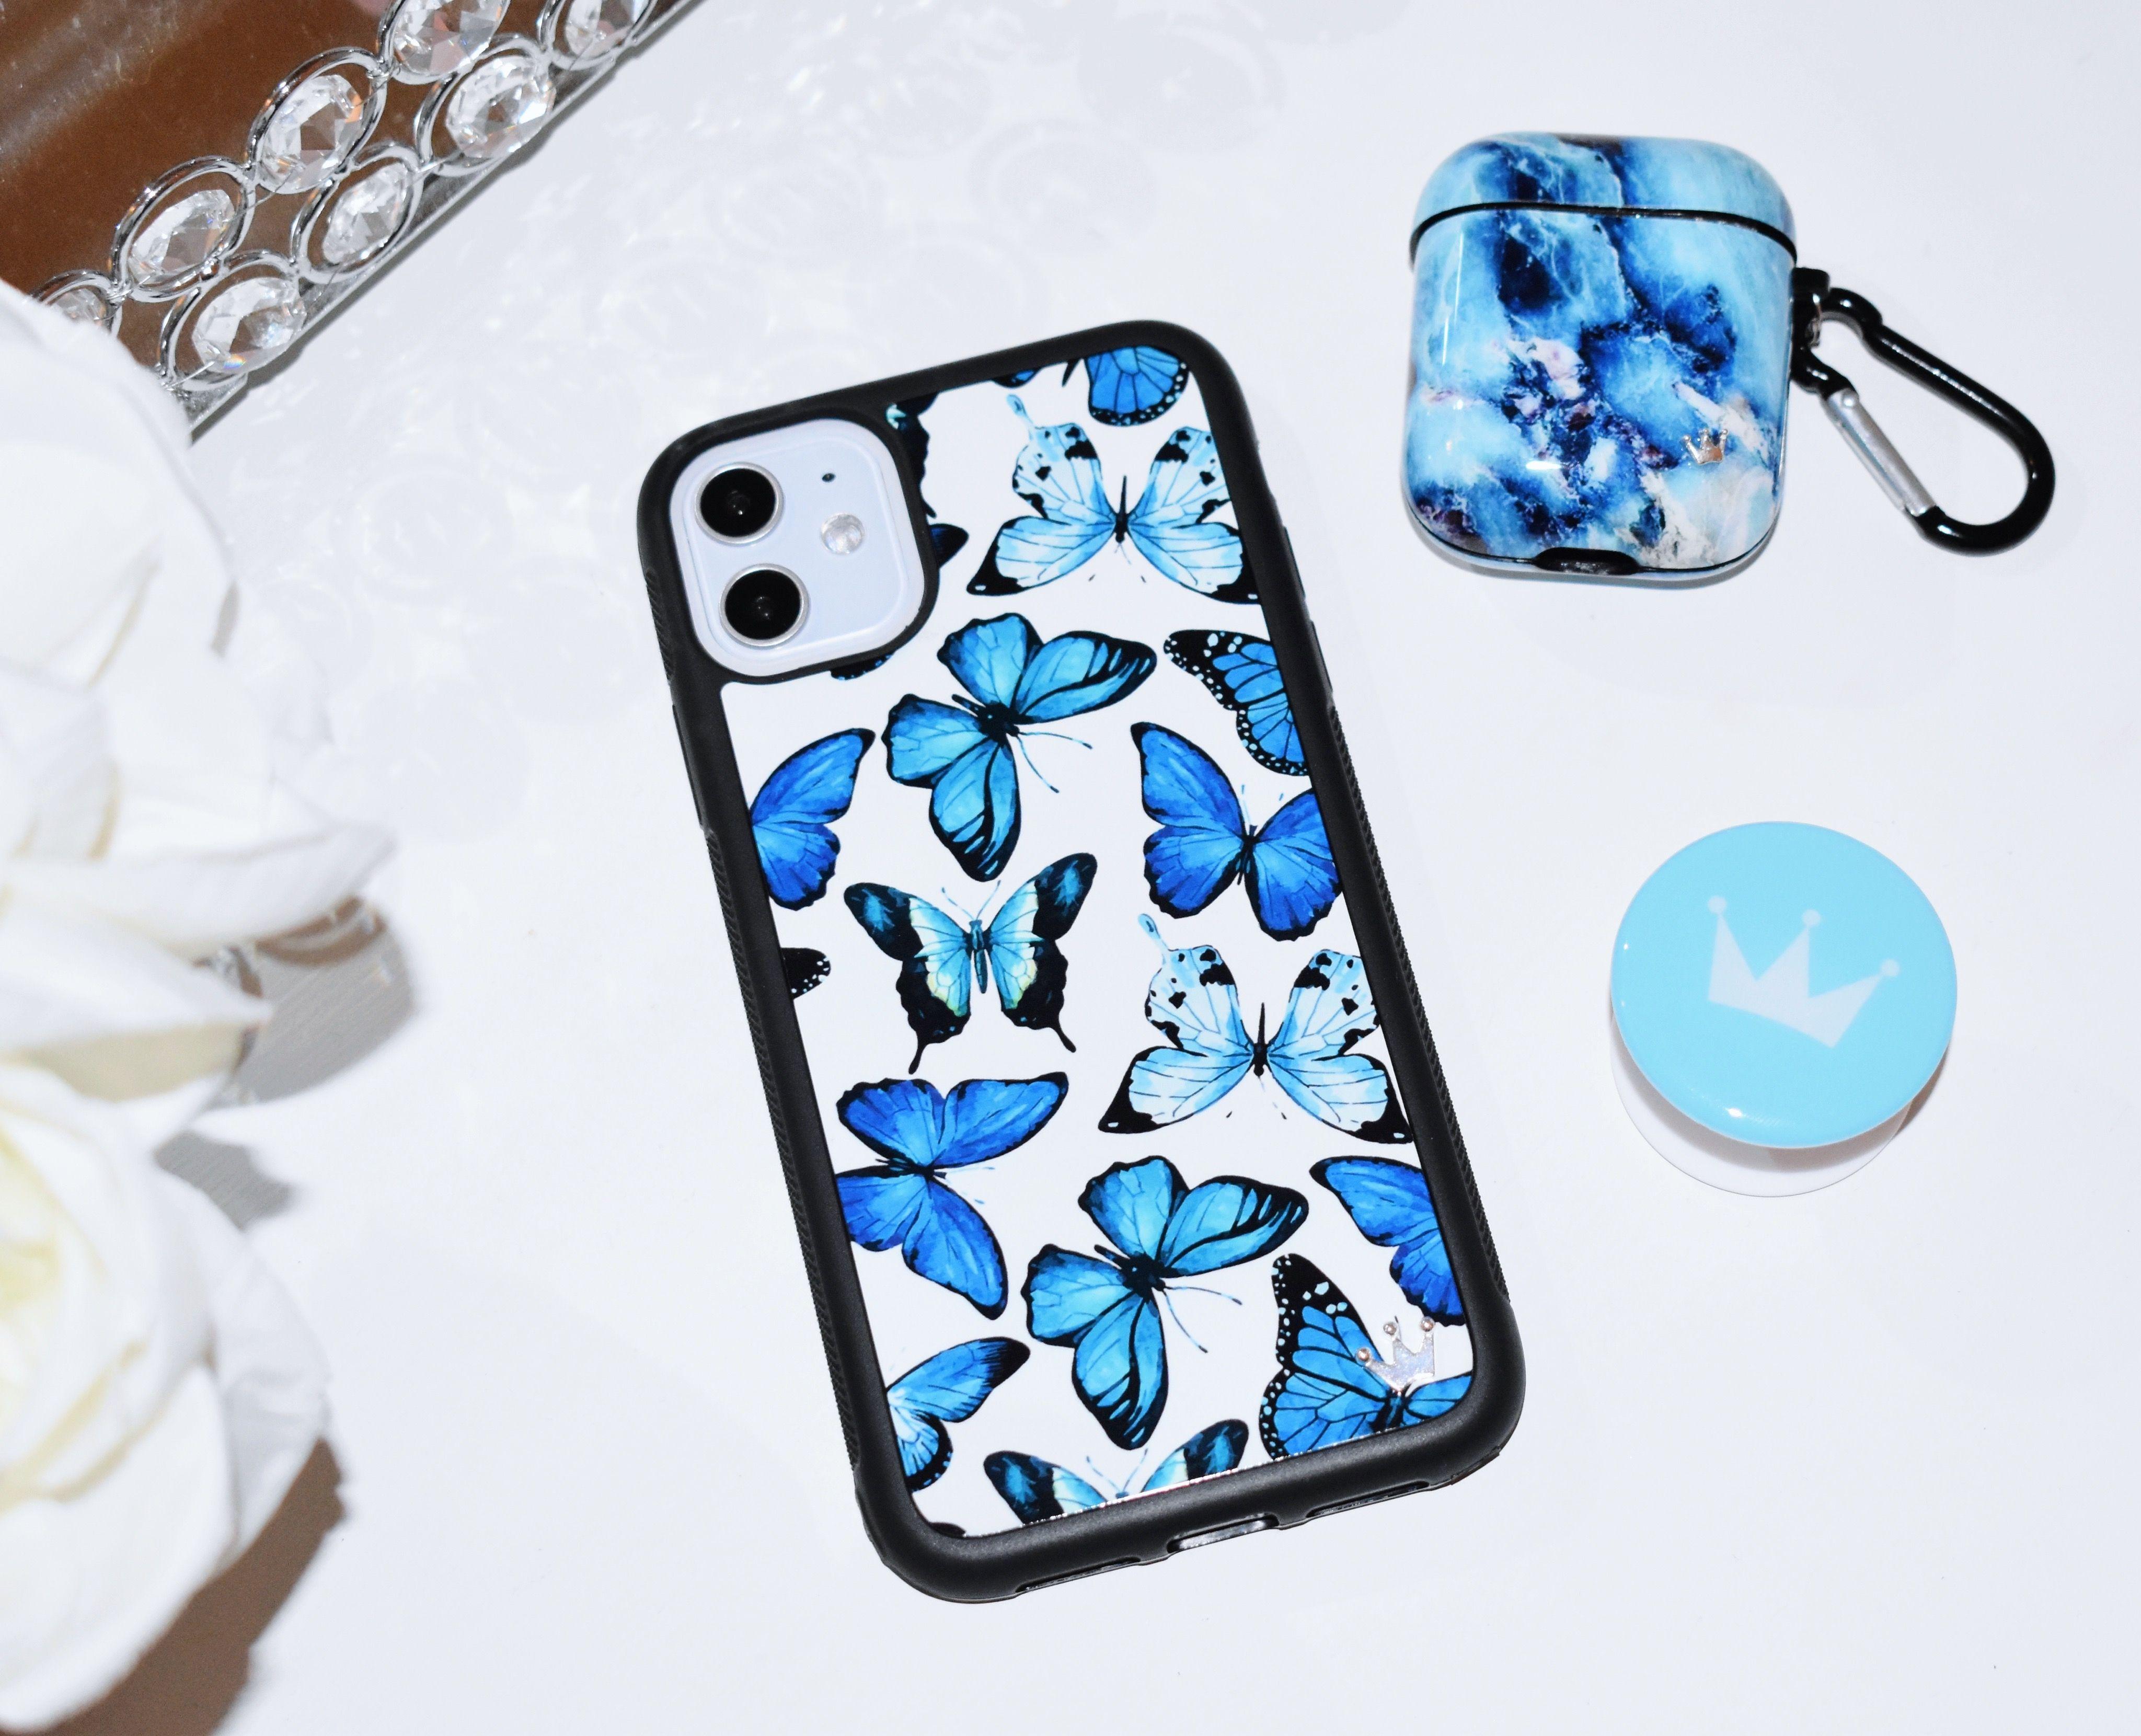 Lilac reign cases bluu butterflies iphone 11 case bluu